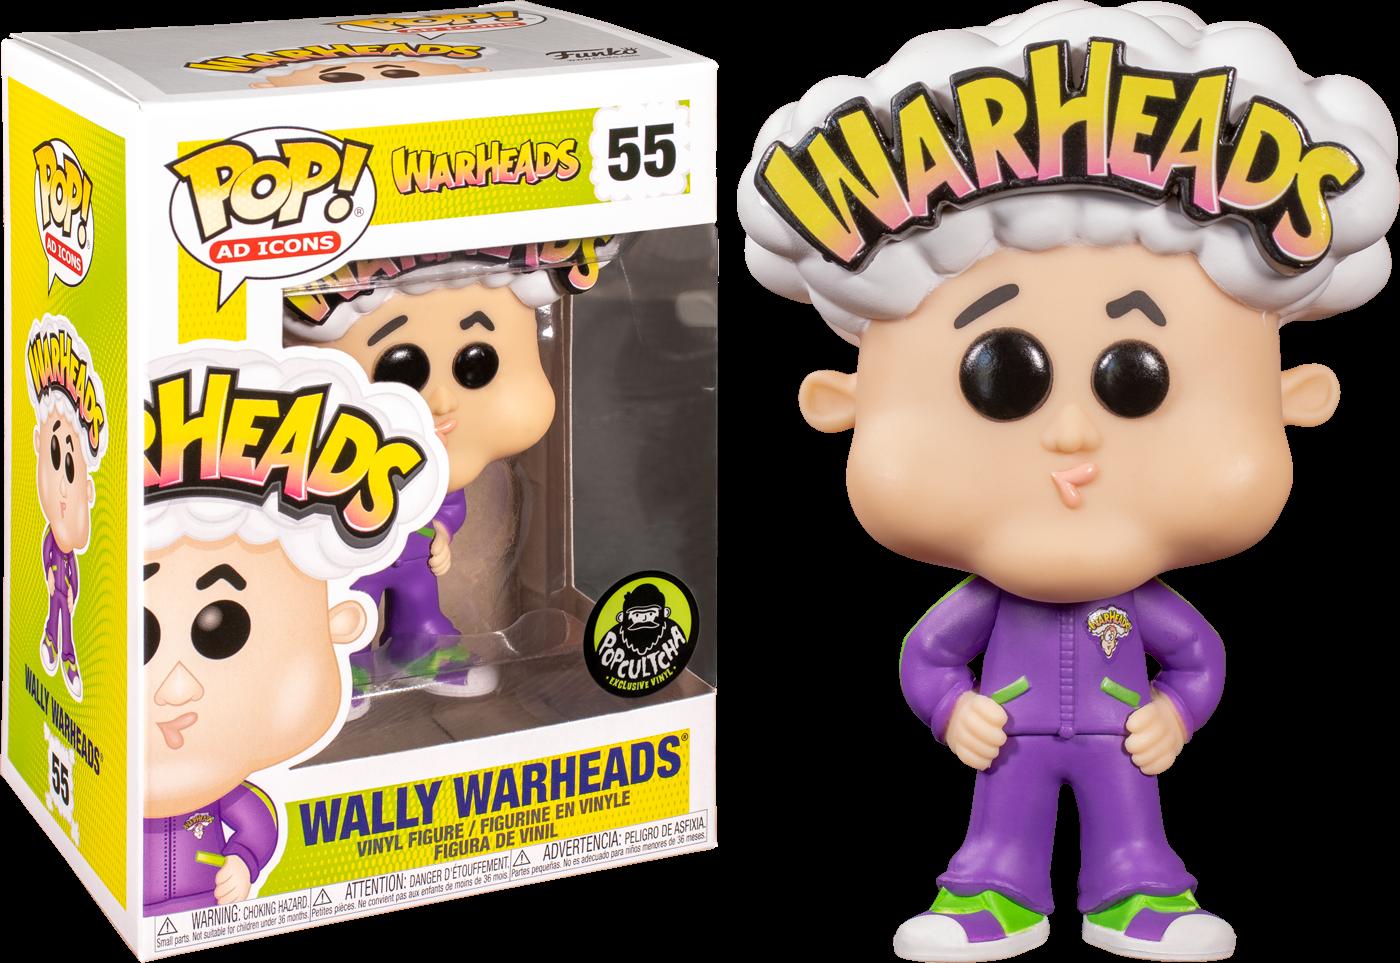 Warheads - Wally Warheads Pop! Vinyl Figure